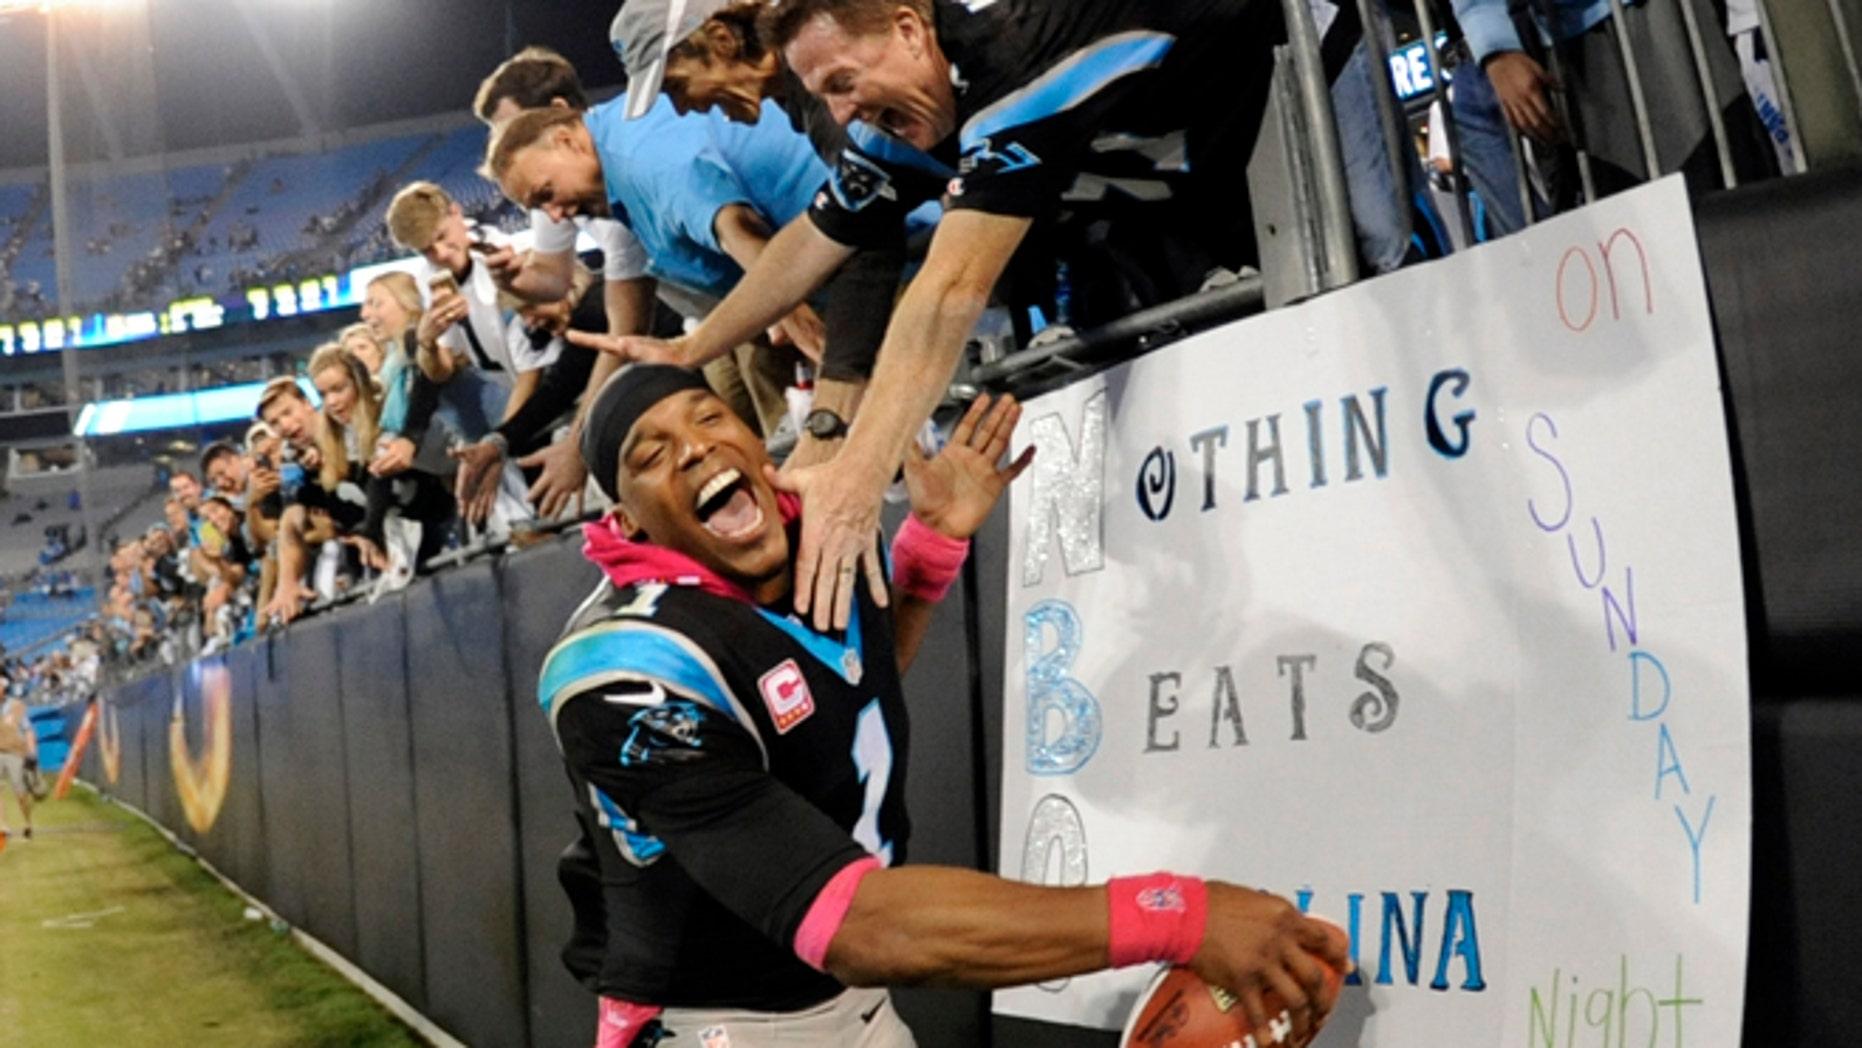 Carolina Panthers' Cam Newtonin Charlotte, N.C., Sunday, Oct. 25, 2015. The Panthers won 27-16.